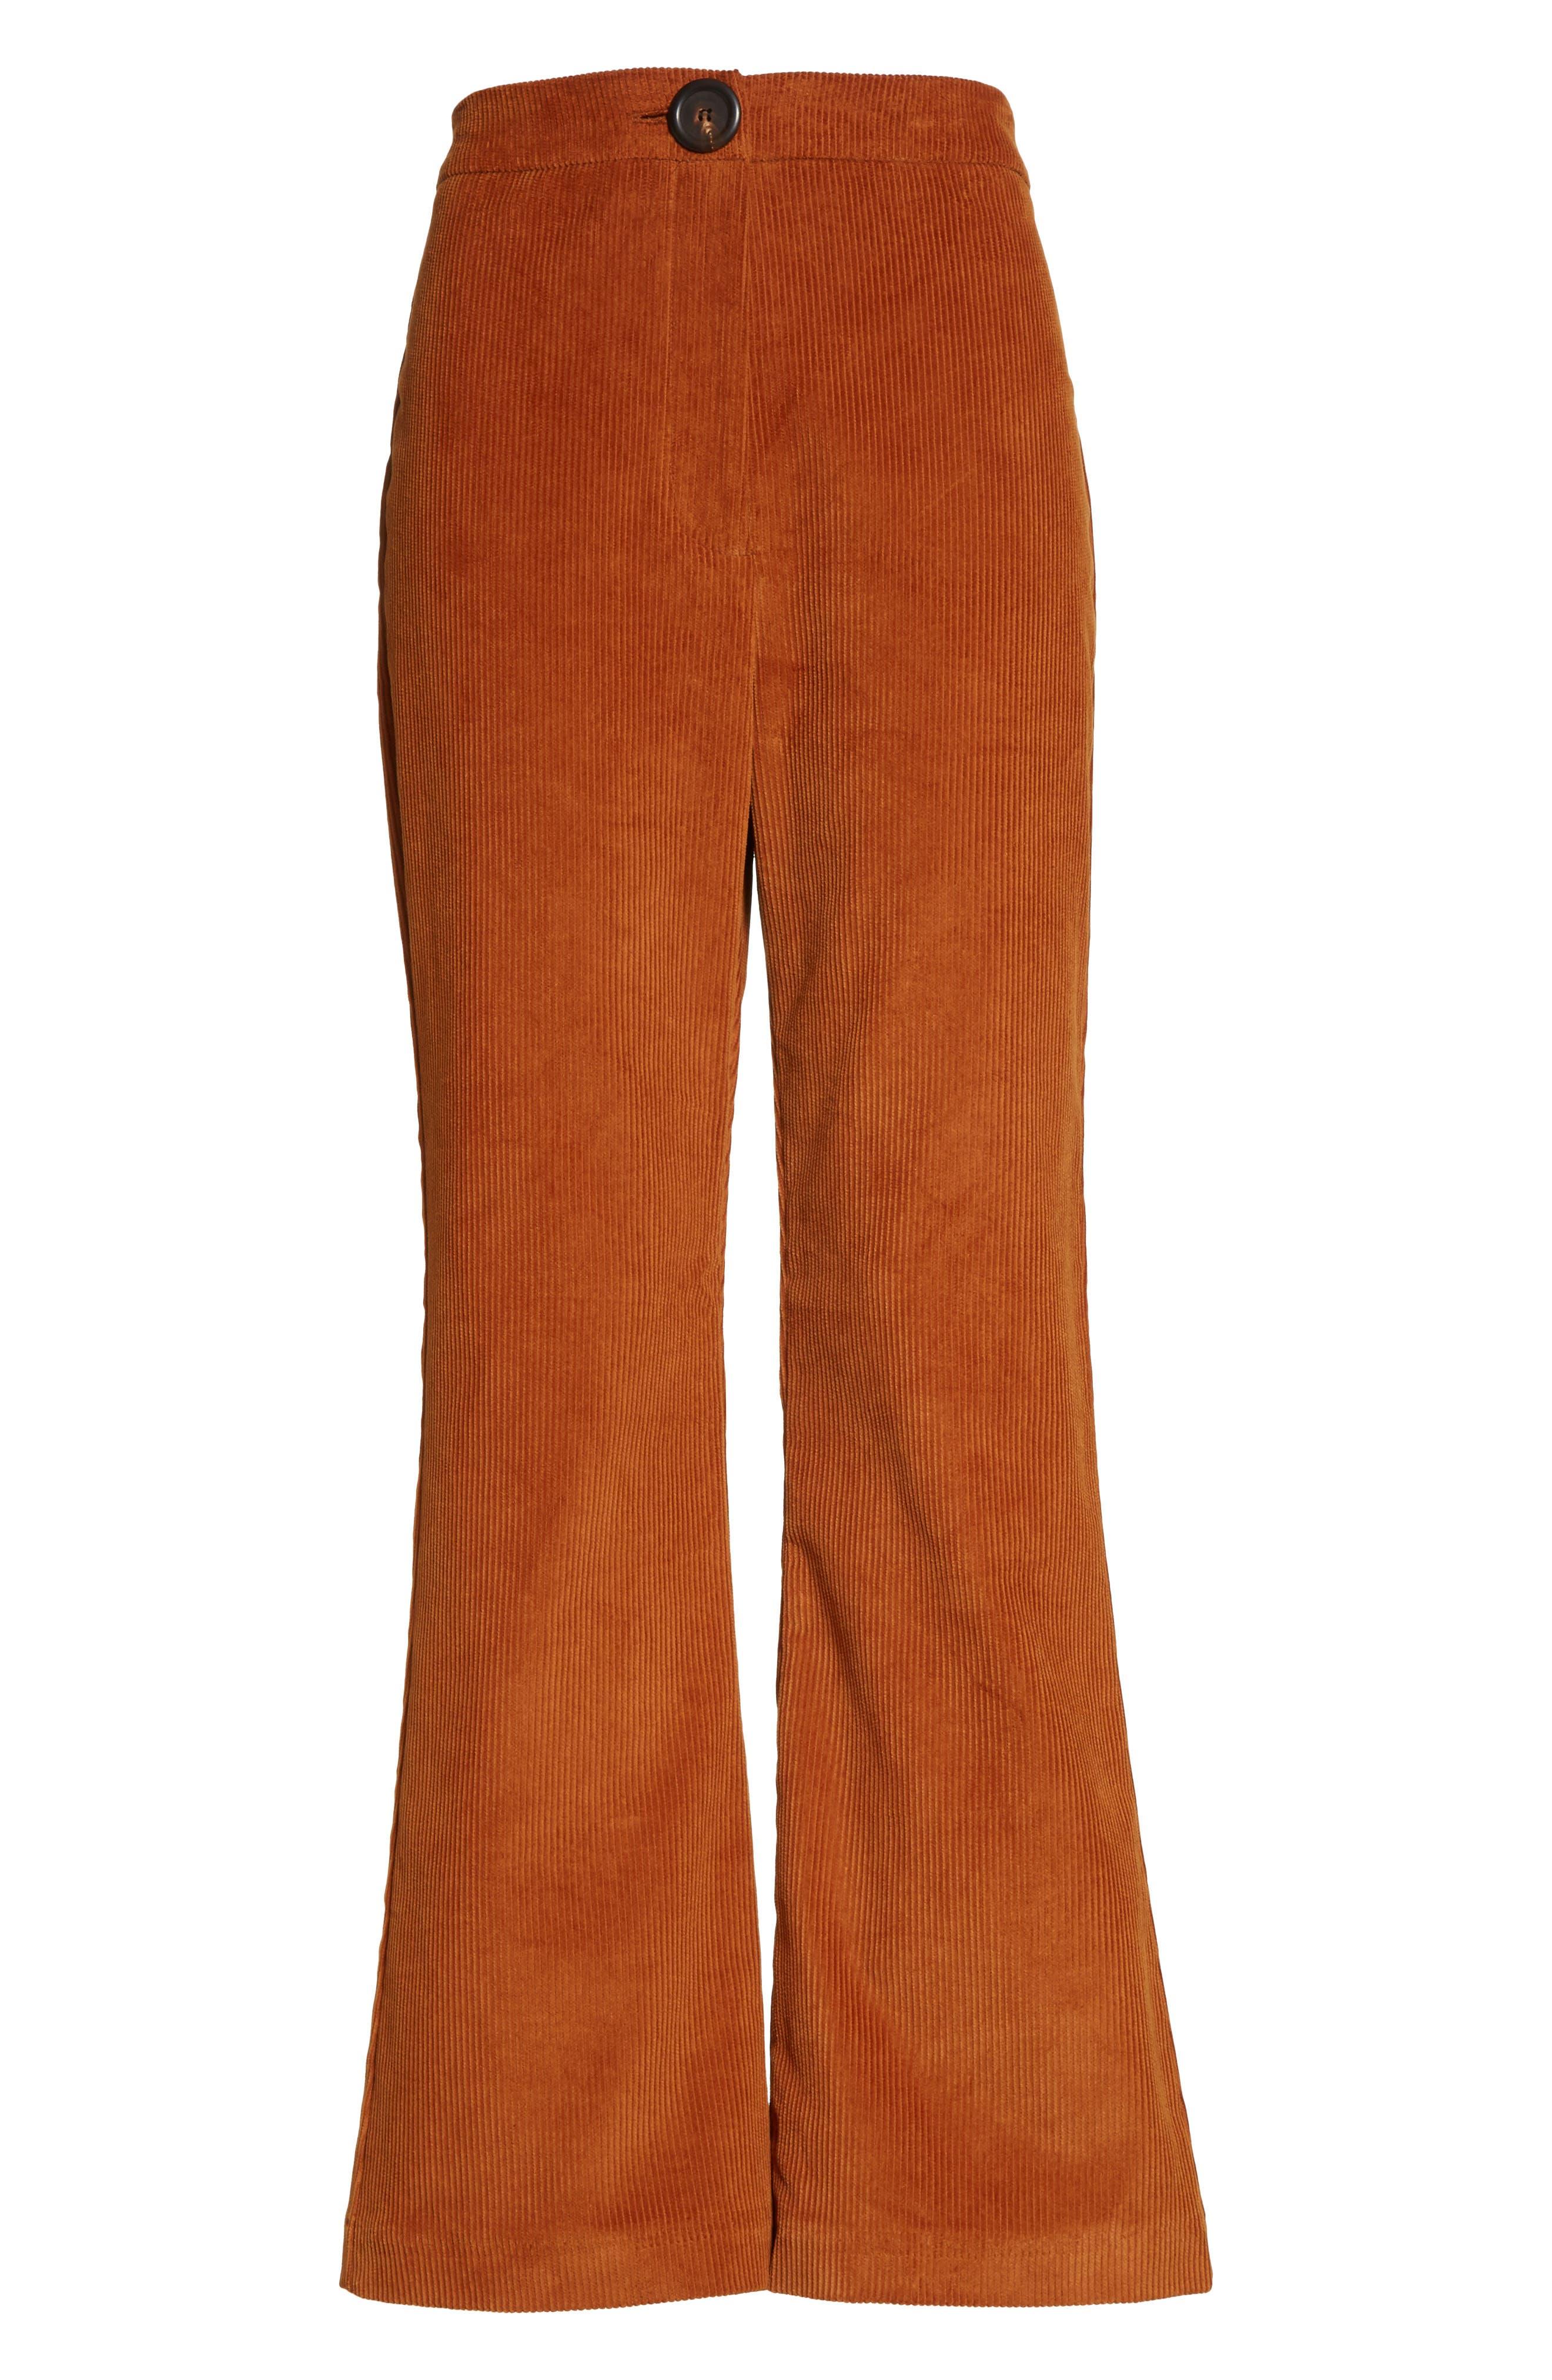 Crop Flare Corduroy Trousers,                             Alternate thumbnail 6, color,                             200